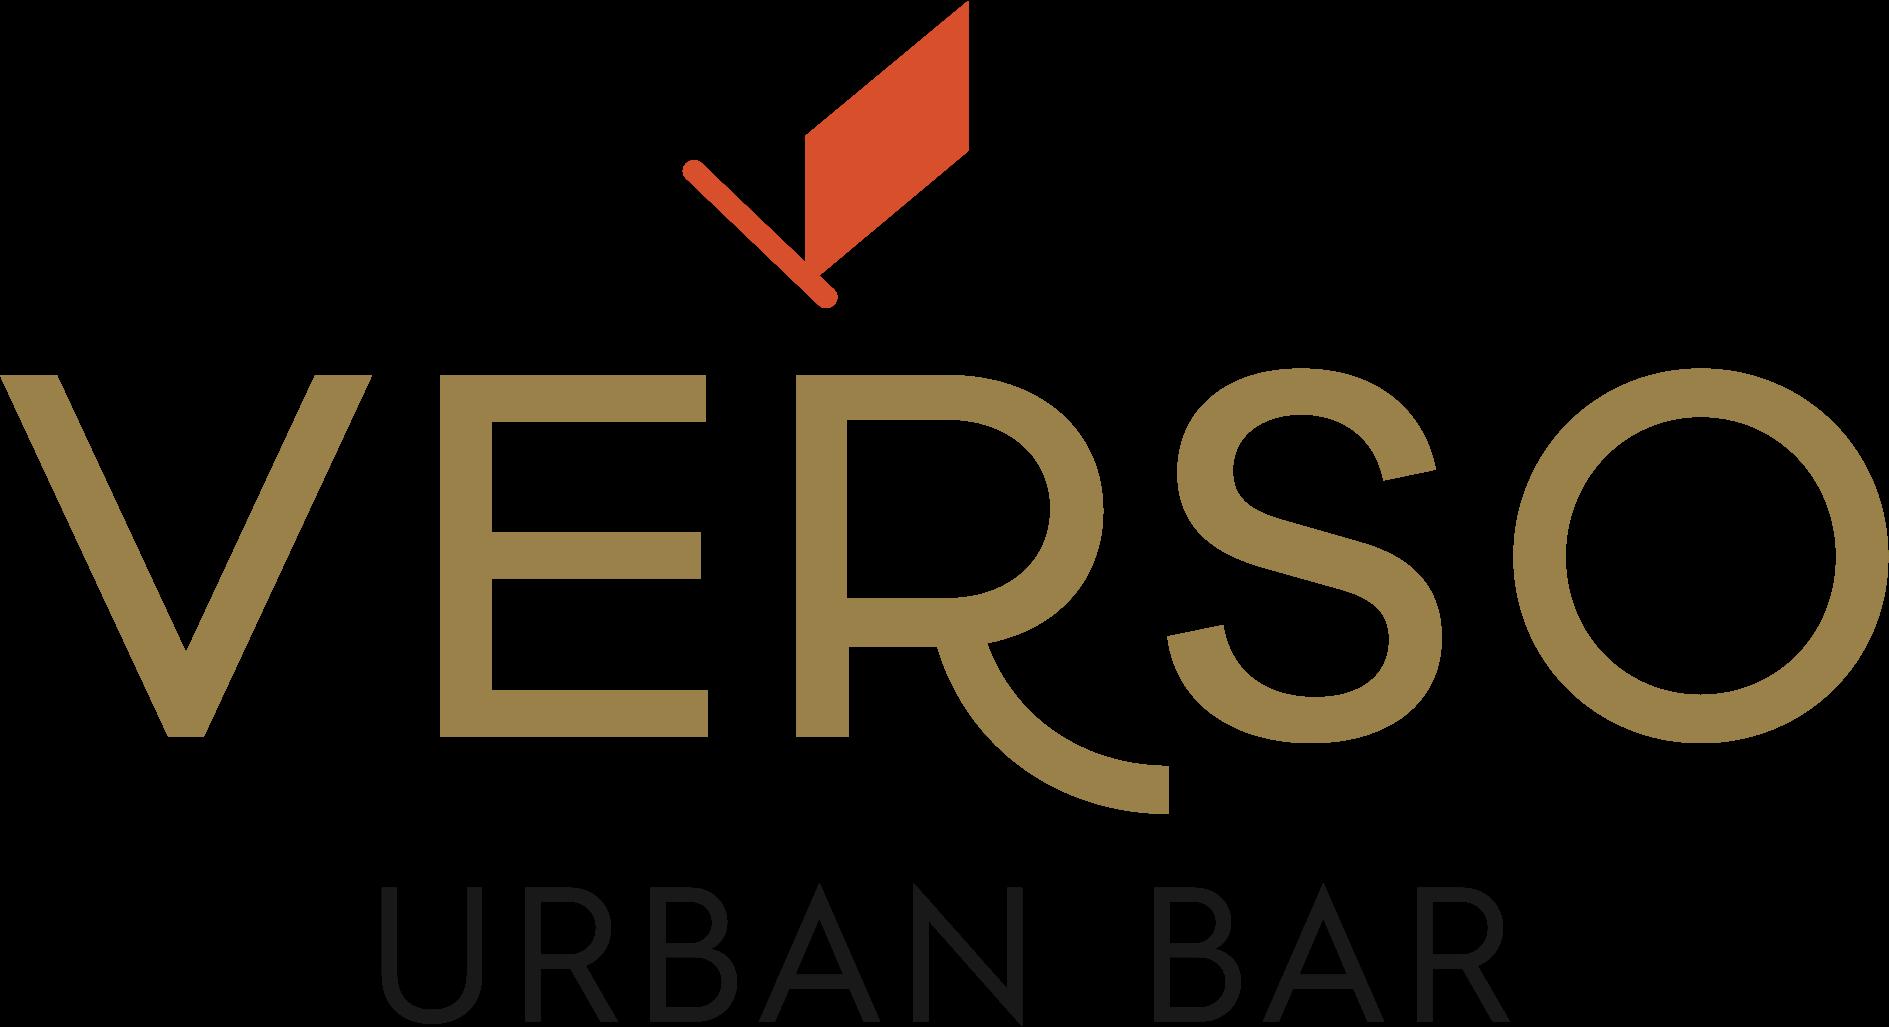 verso urban bar